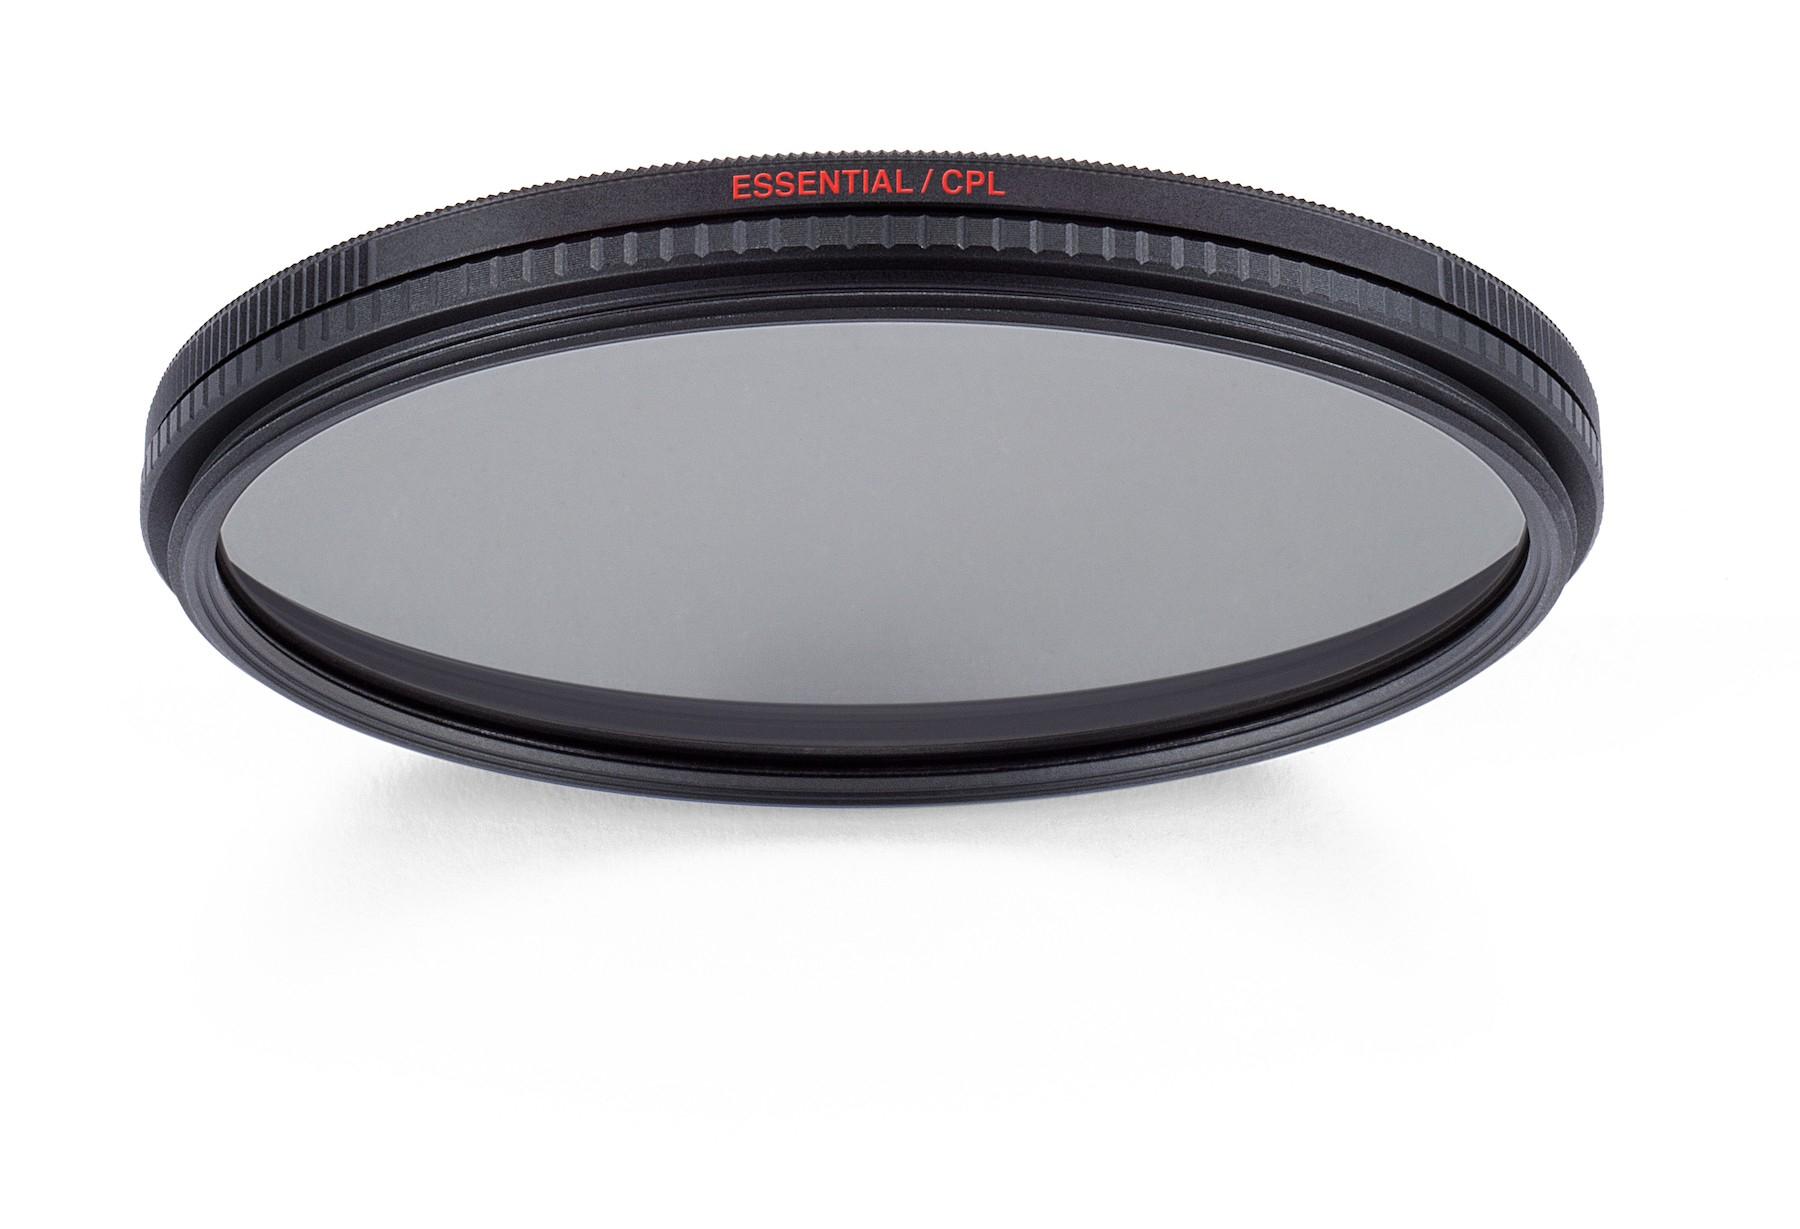 58mm Essential Circular Polarizing Filter